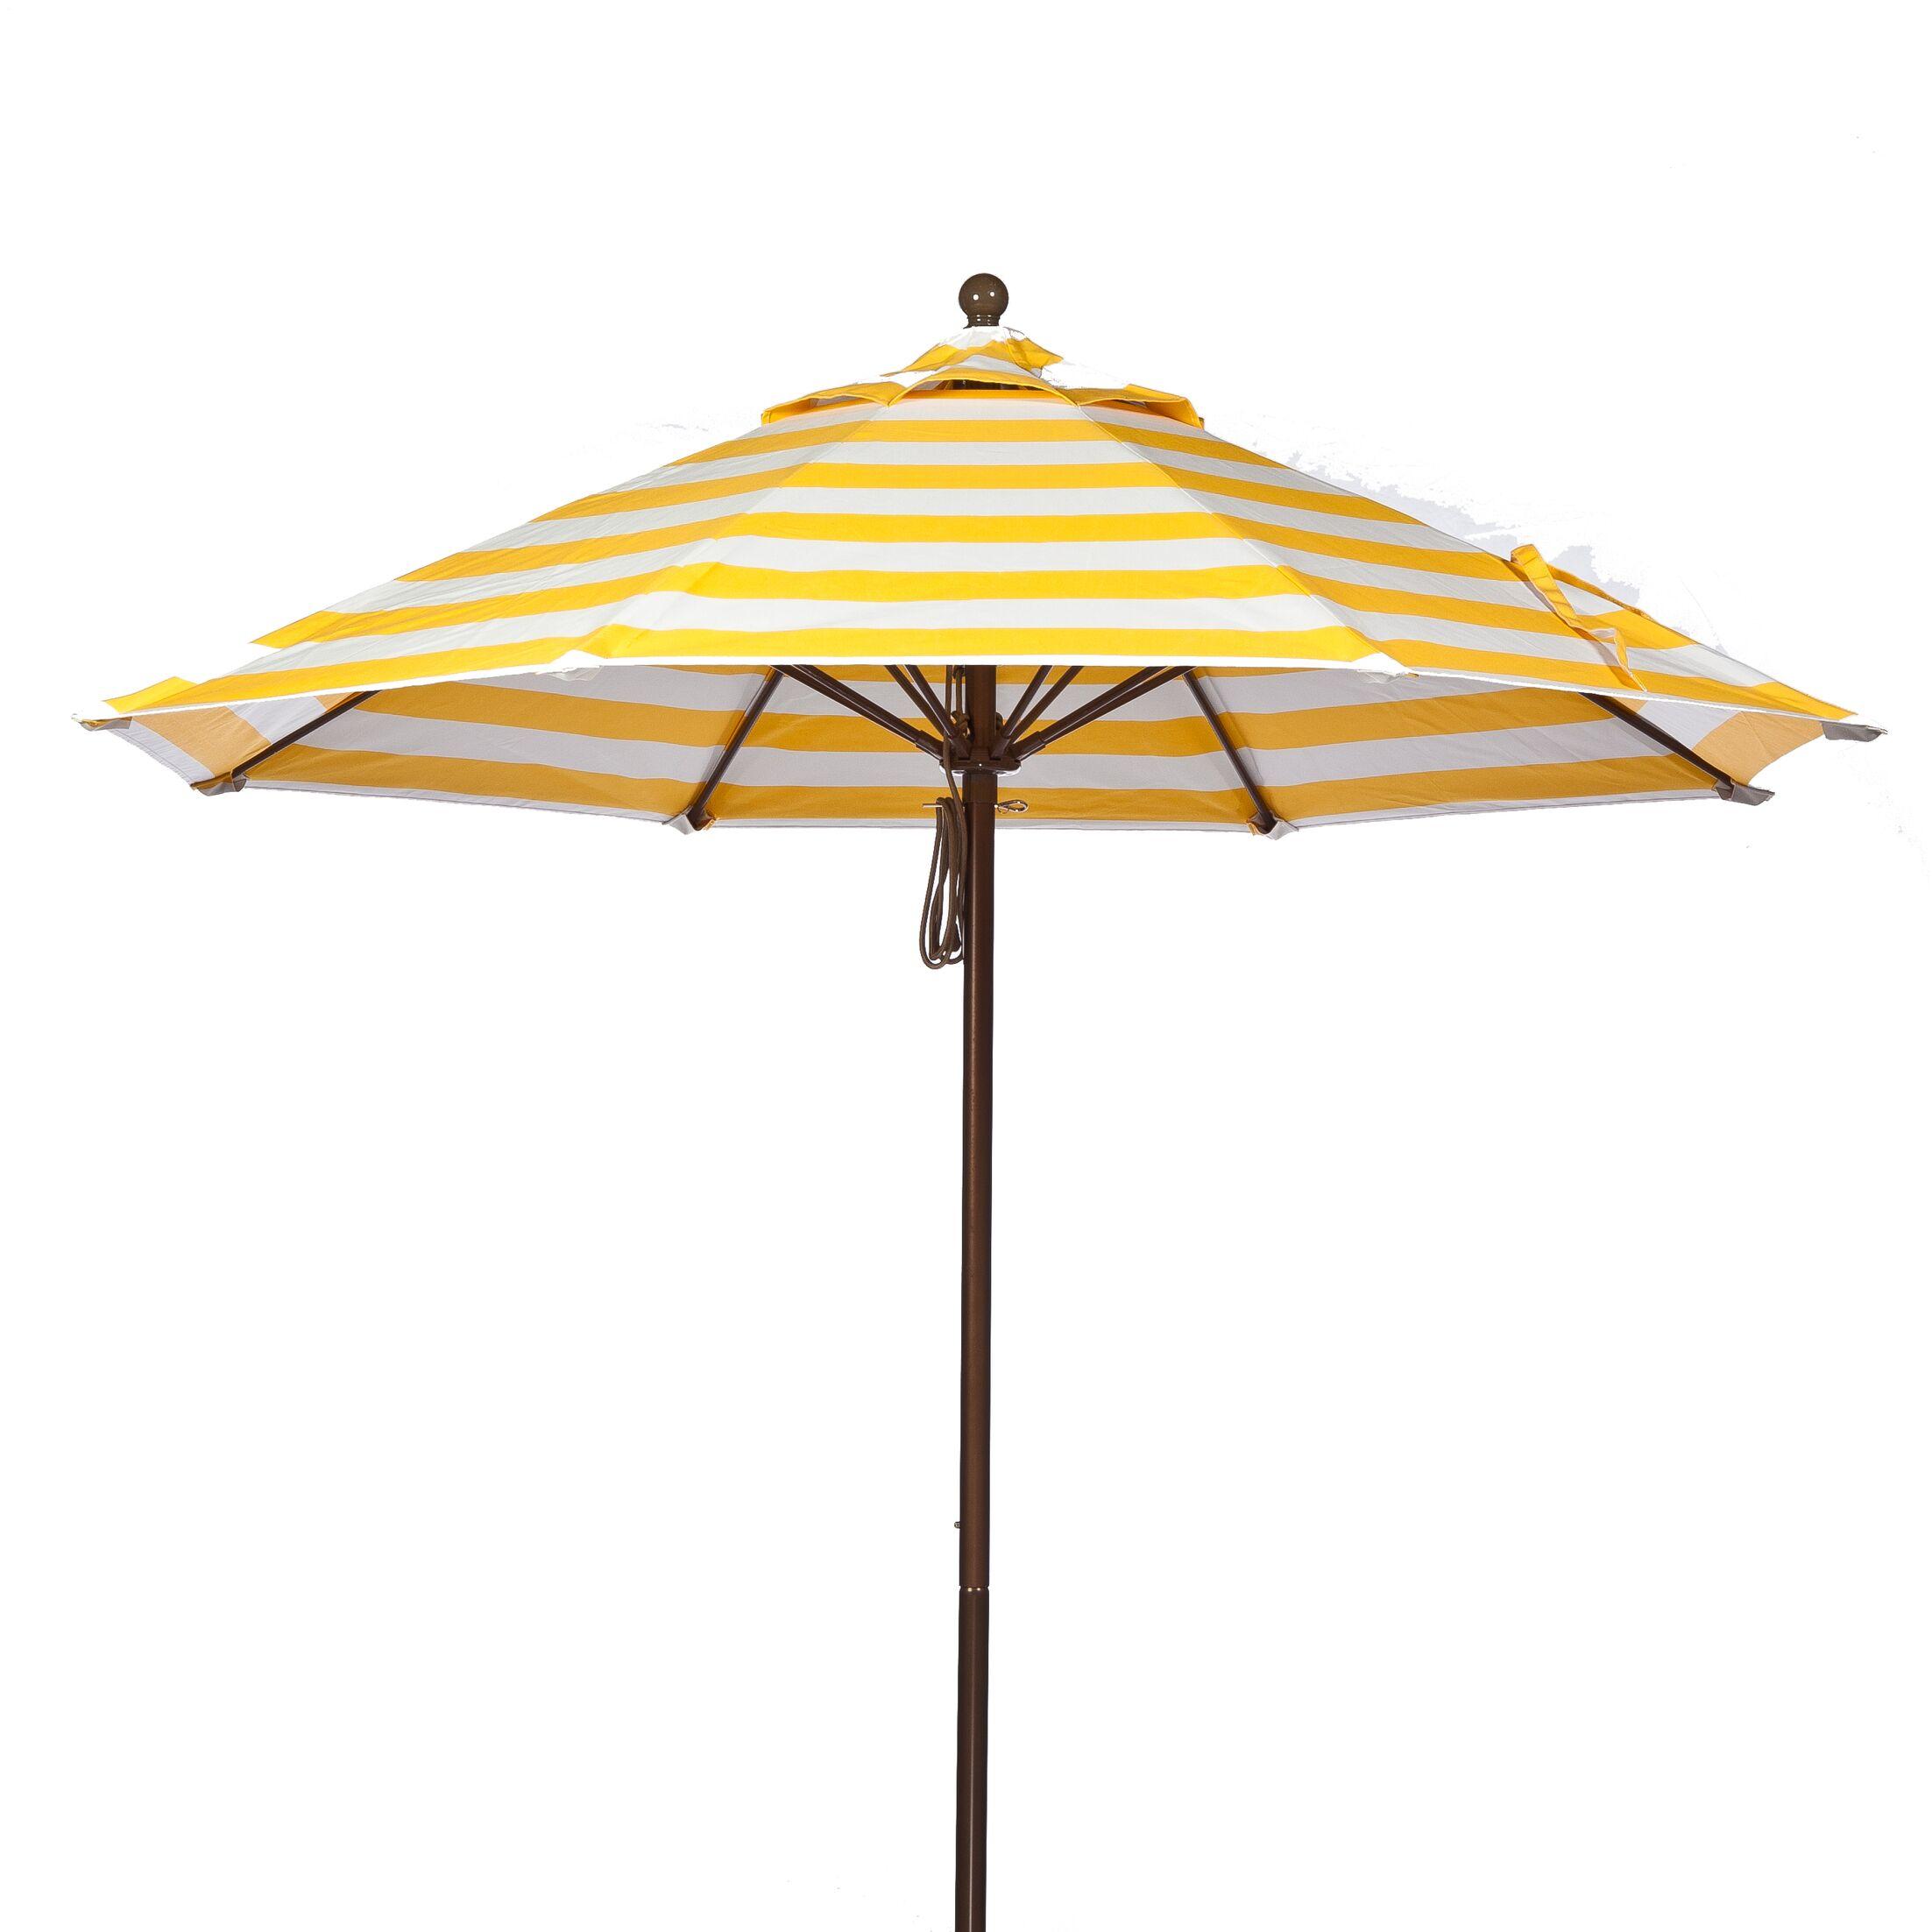 11' Market Umbrella Pole Type: Bronze Coated Aluminum Pole, Fabric: Yellow and White Stripe